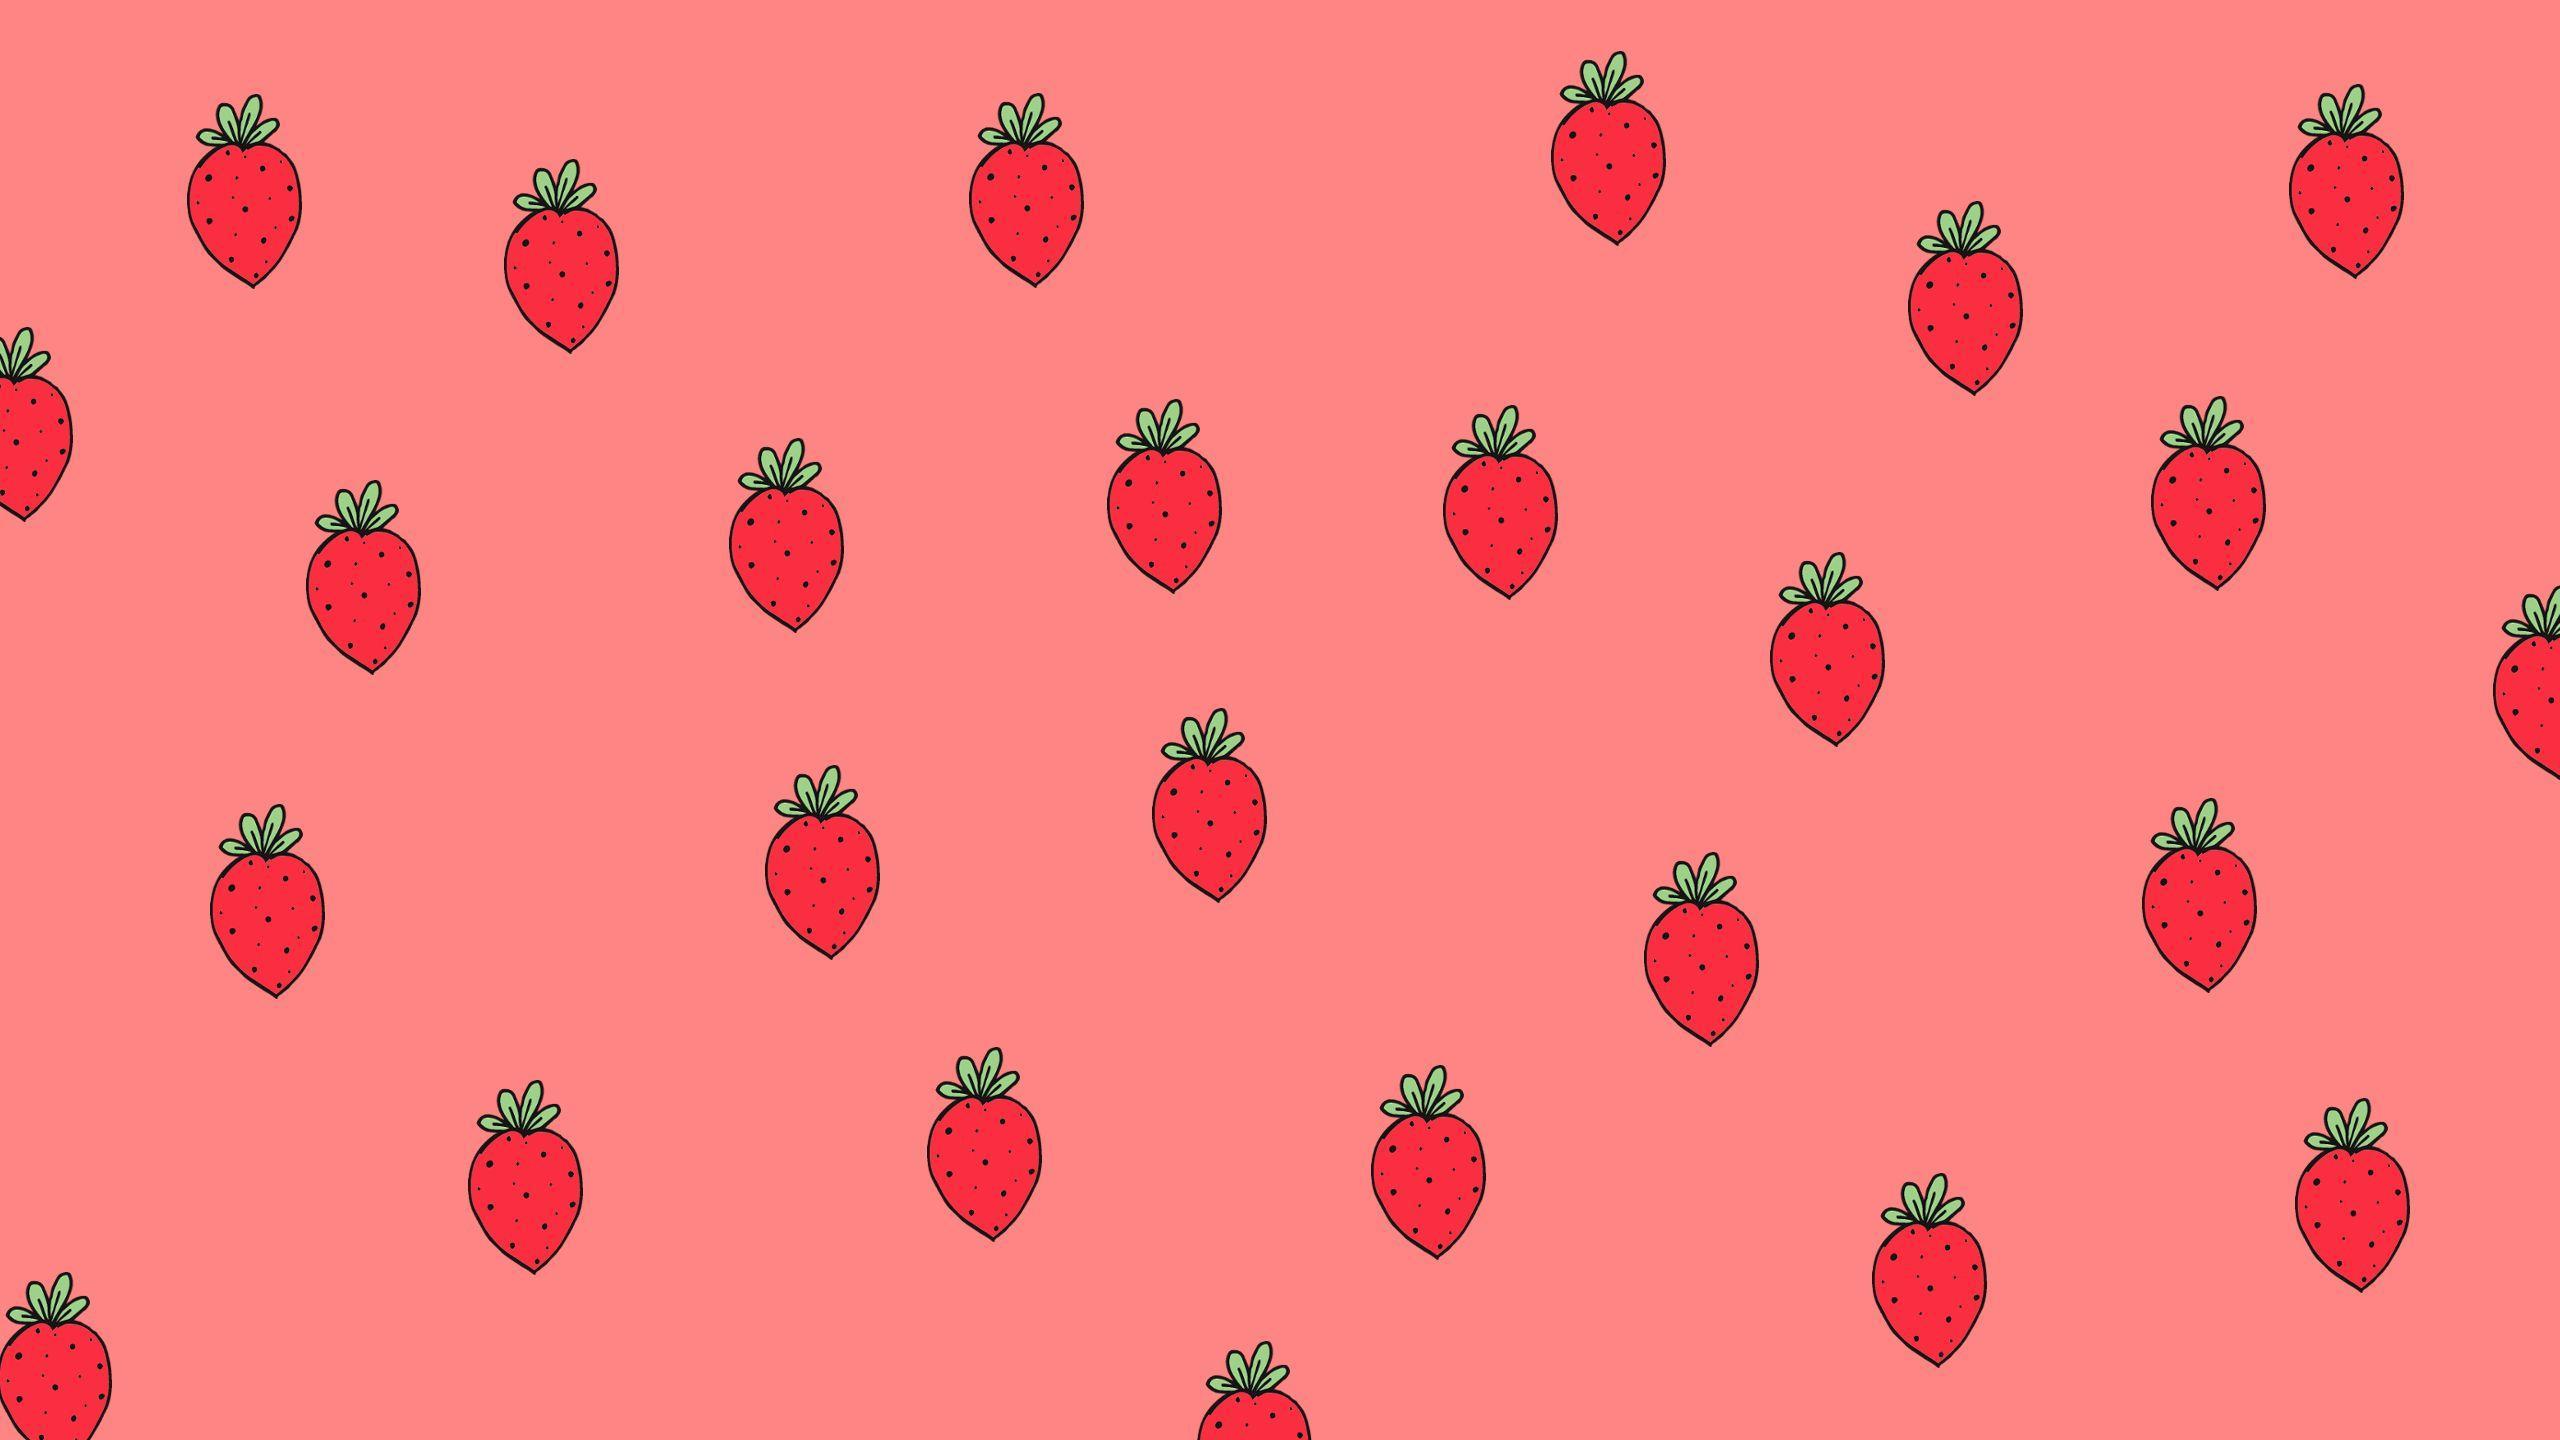 Strawberry Desktop Wallpapers Top Free Strawberry Desktop Backgrounds Wallpaperaccess